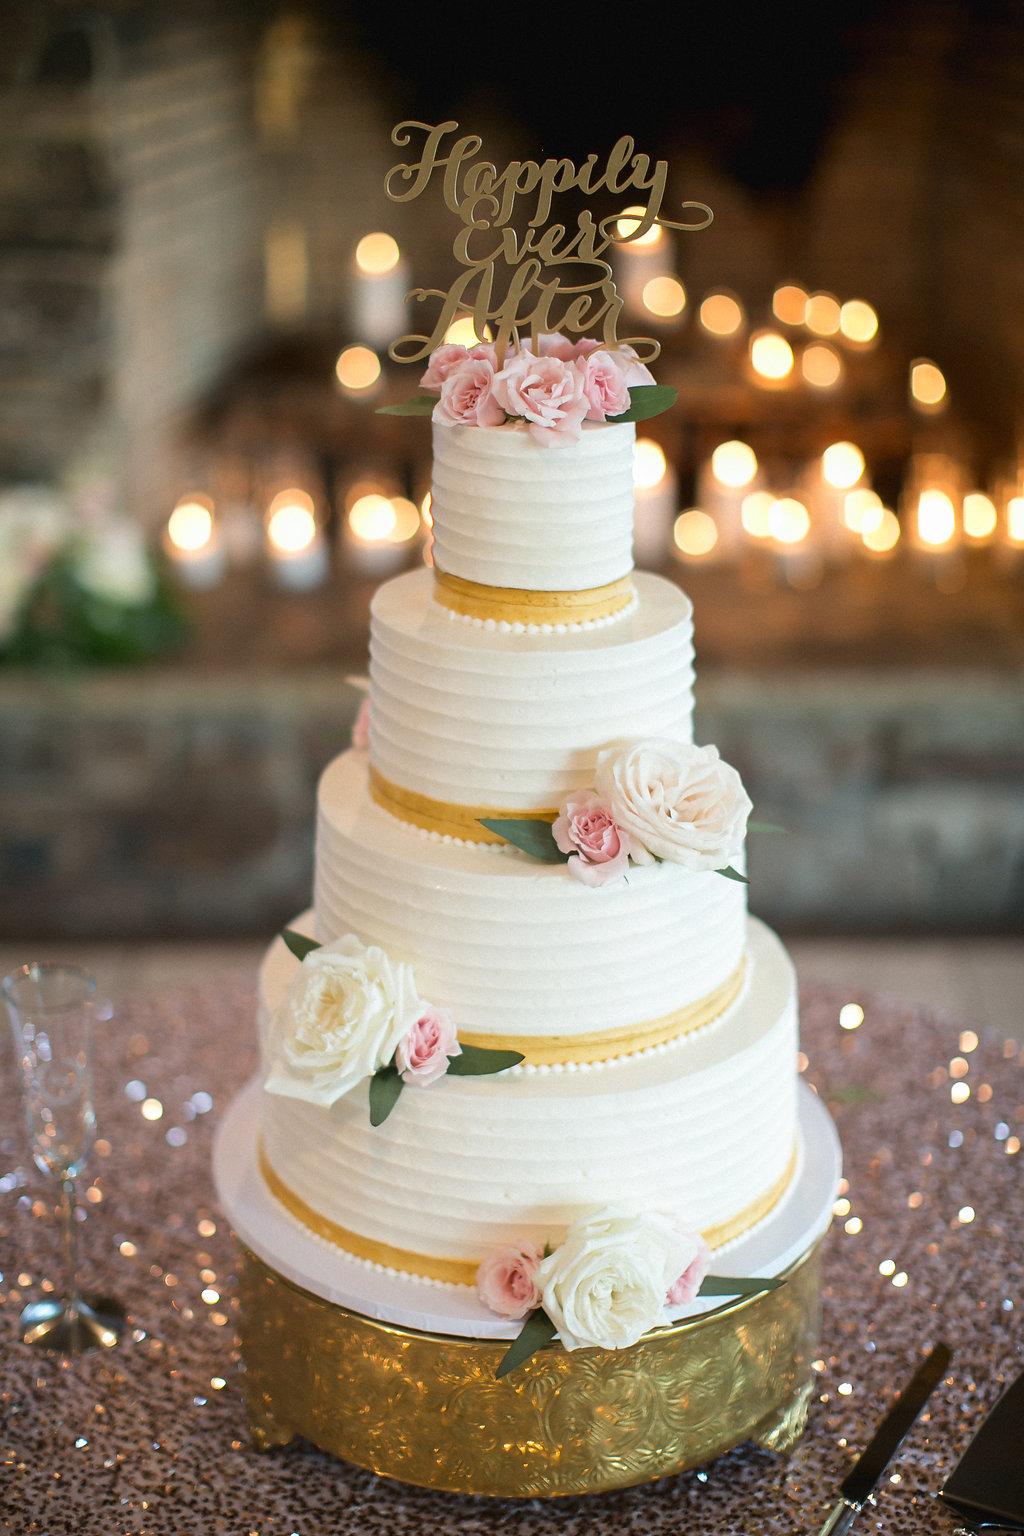 Foxhall-Resort-Wedding-Floral-Design-35.jpg